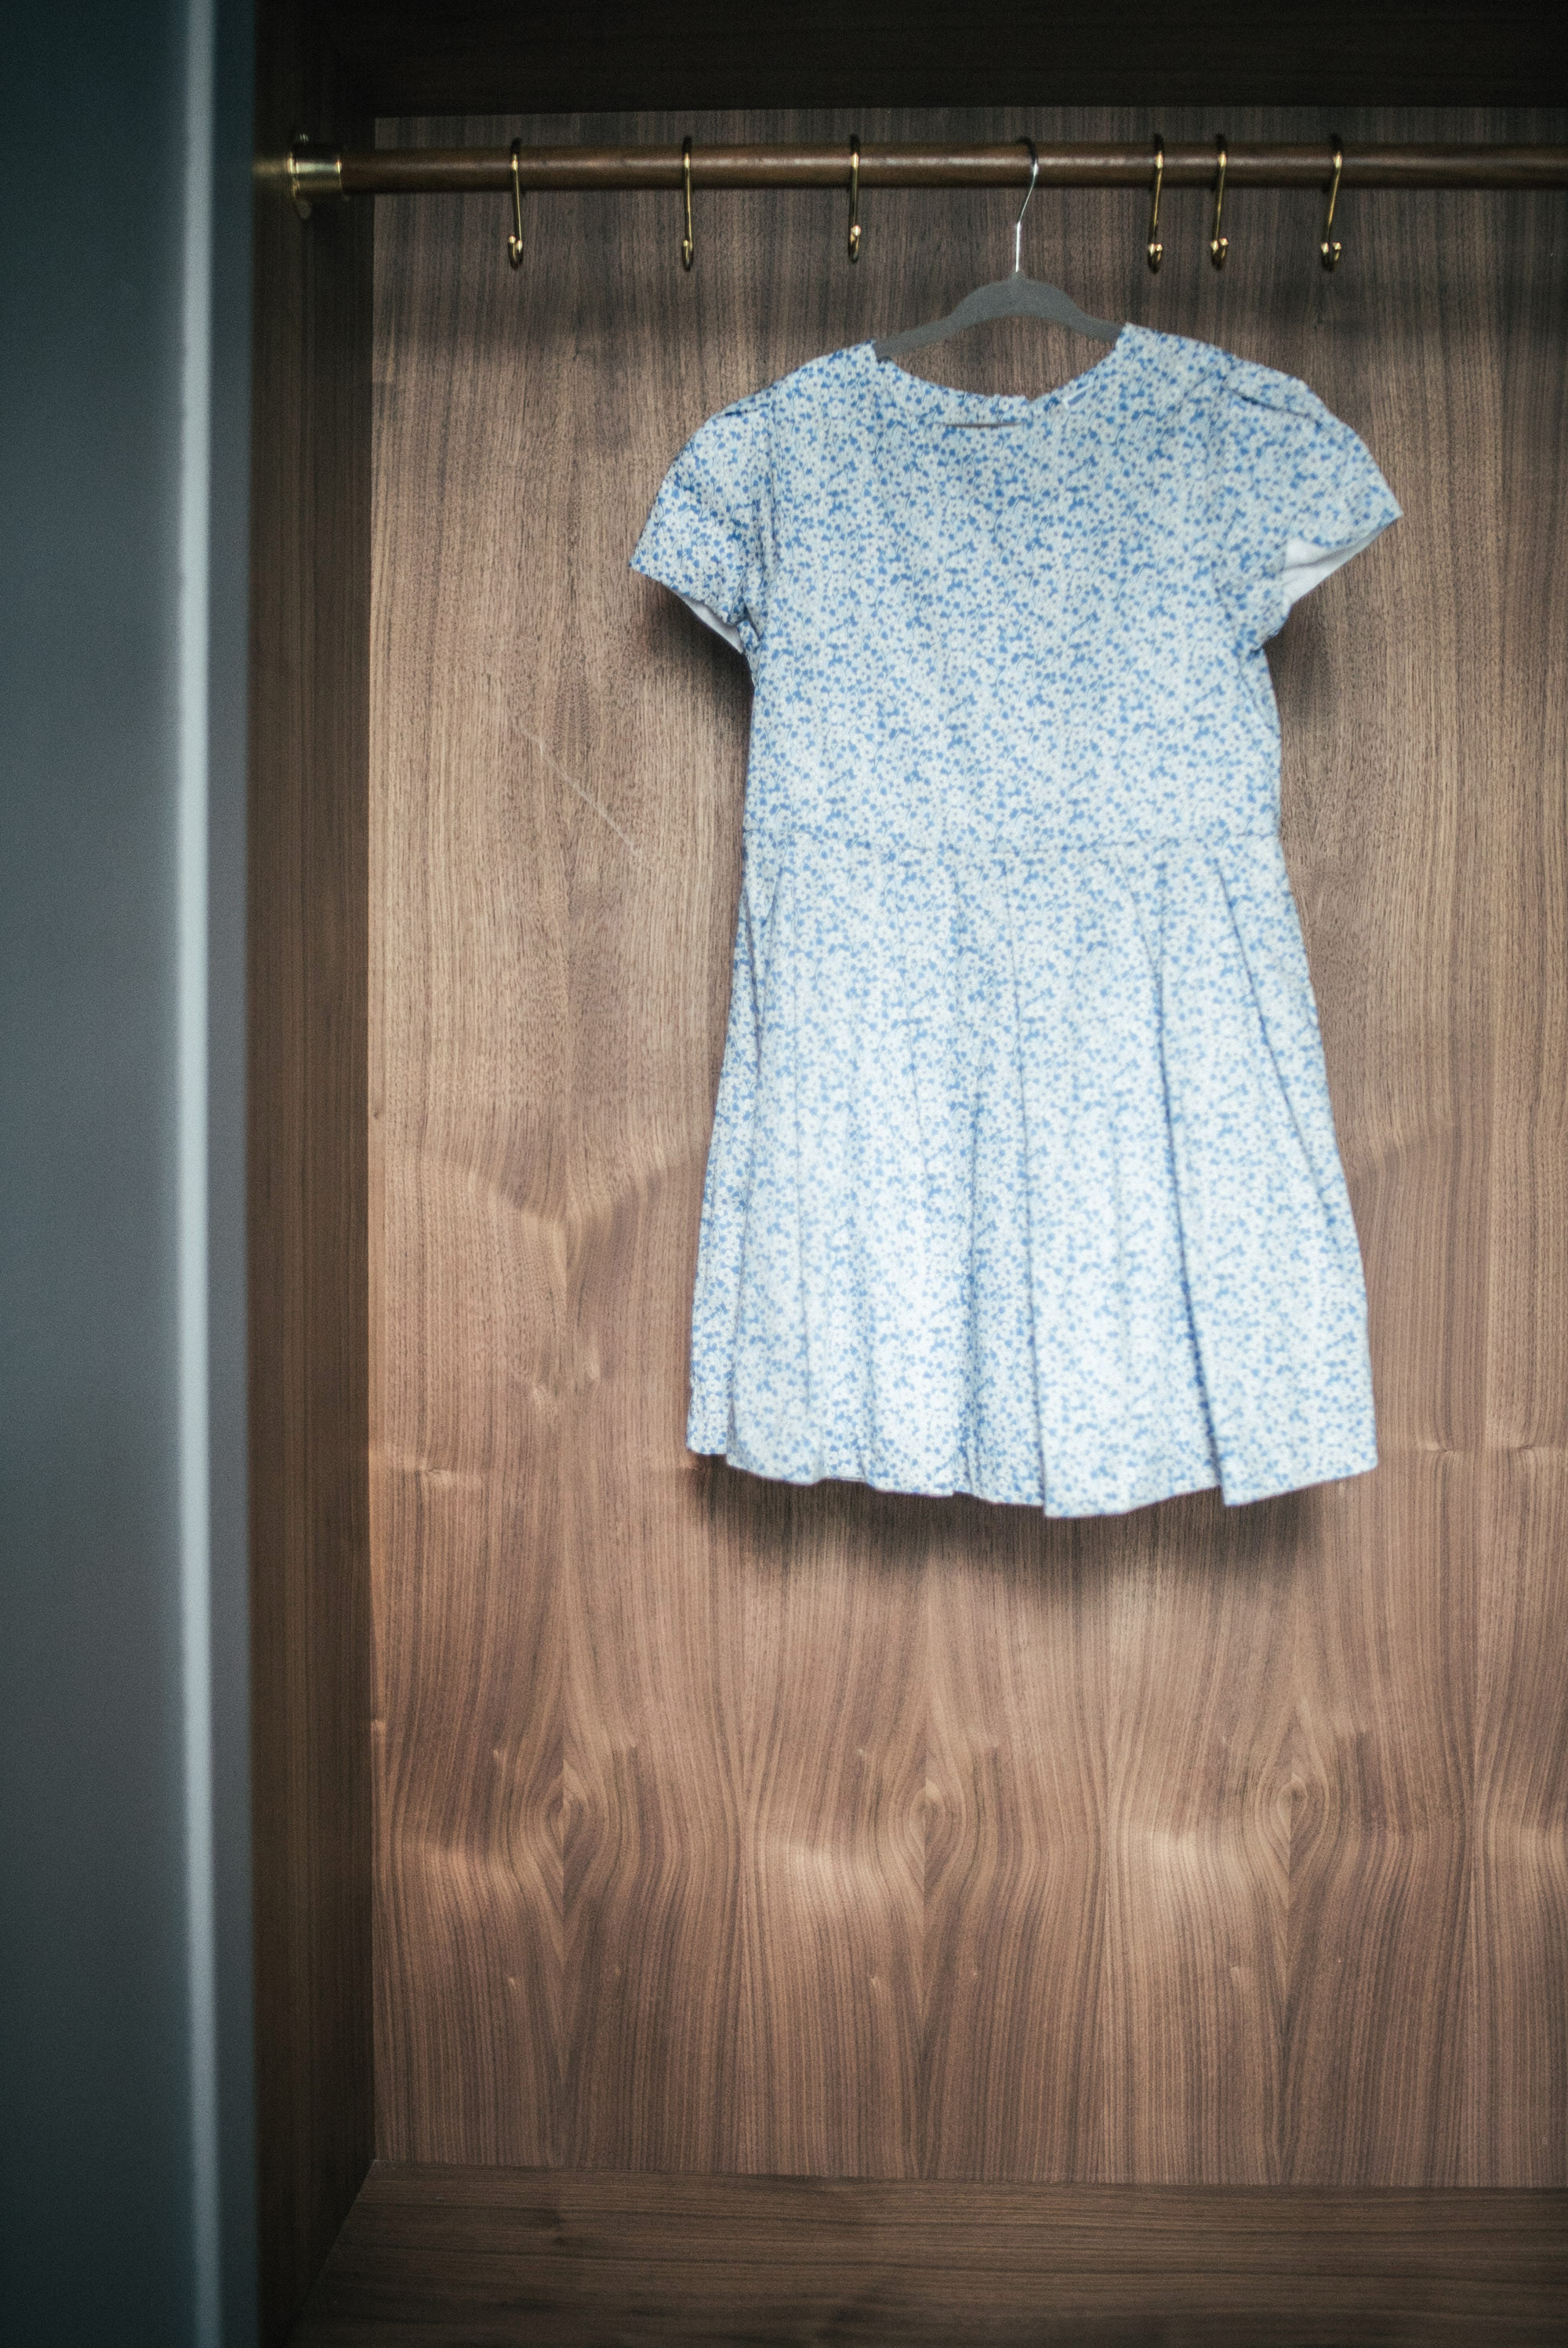 P&J – Rathgar – Dress in wardrobe